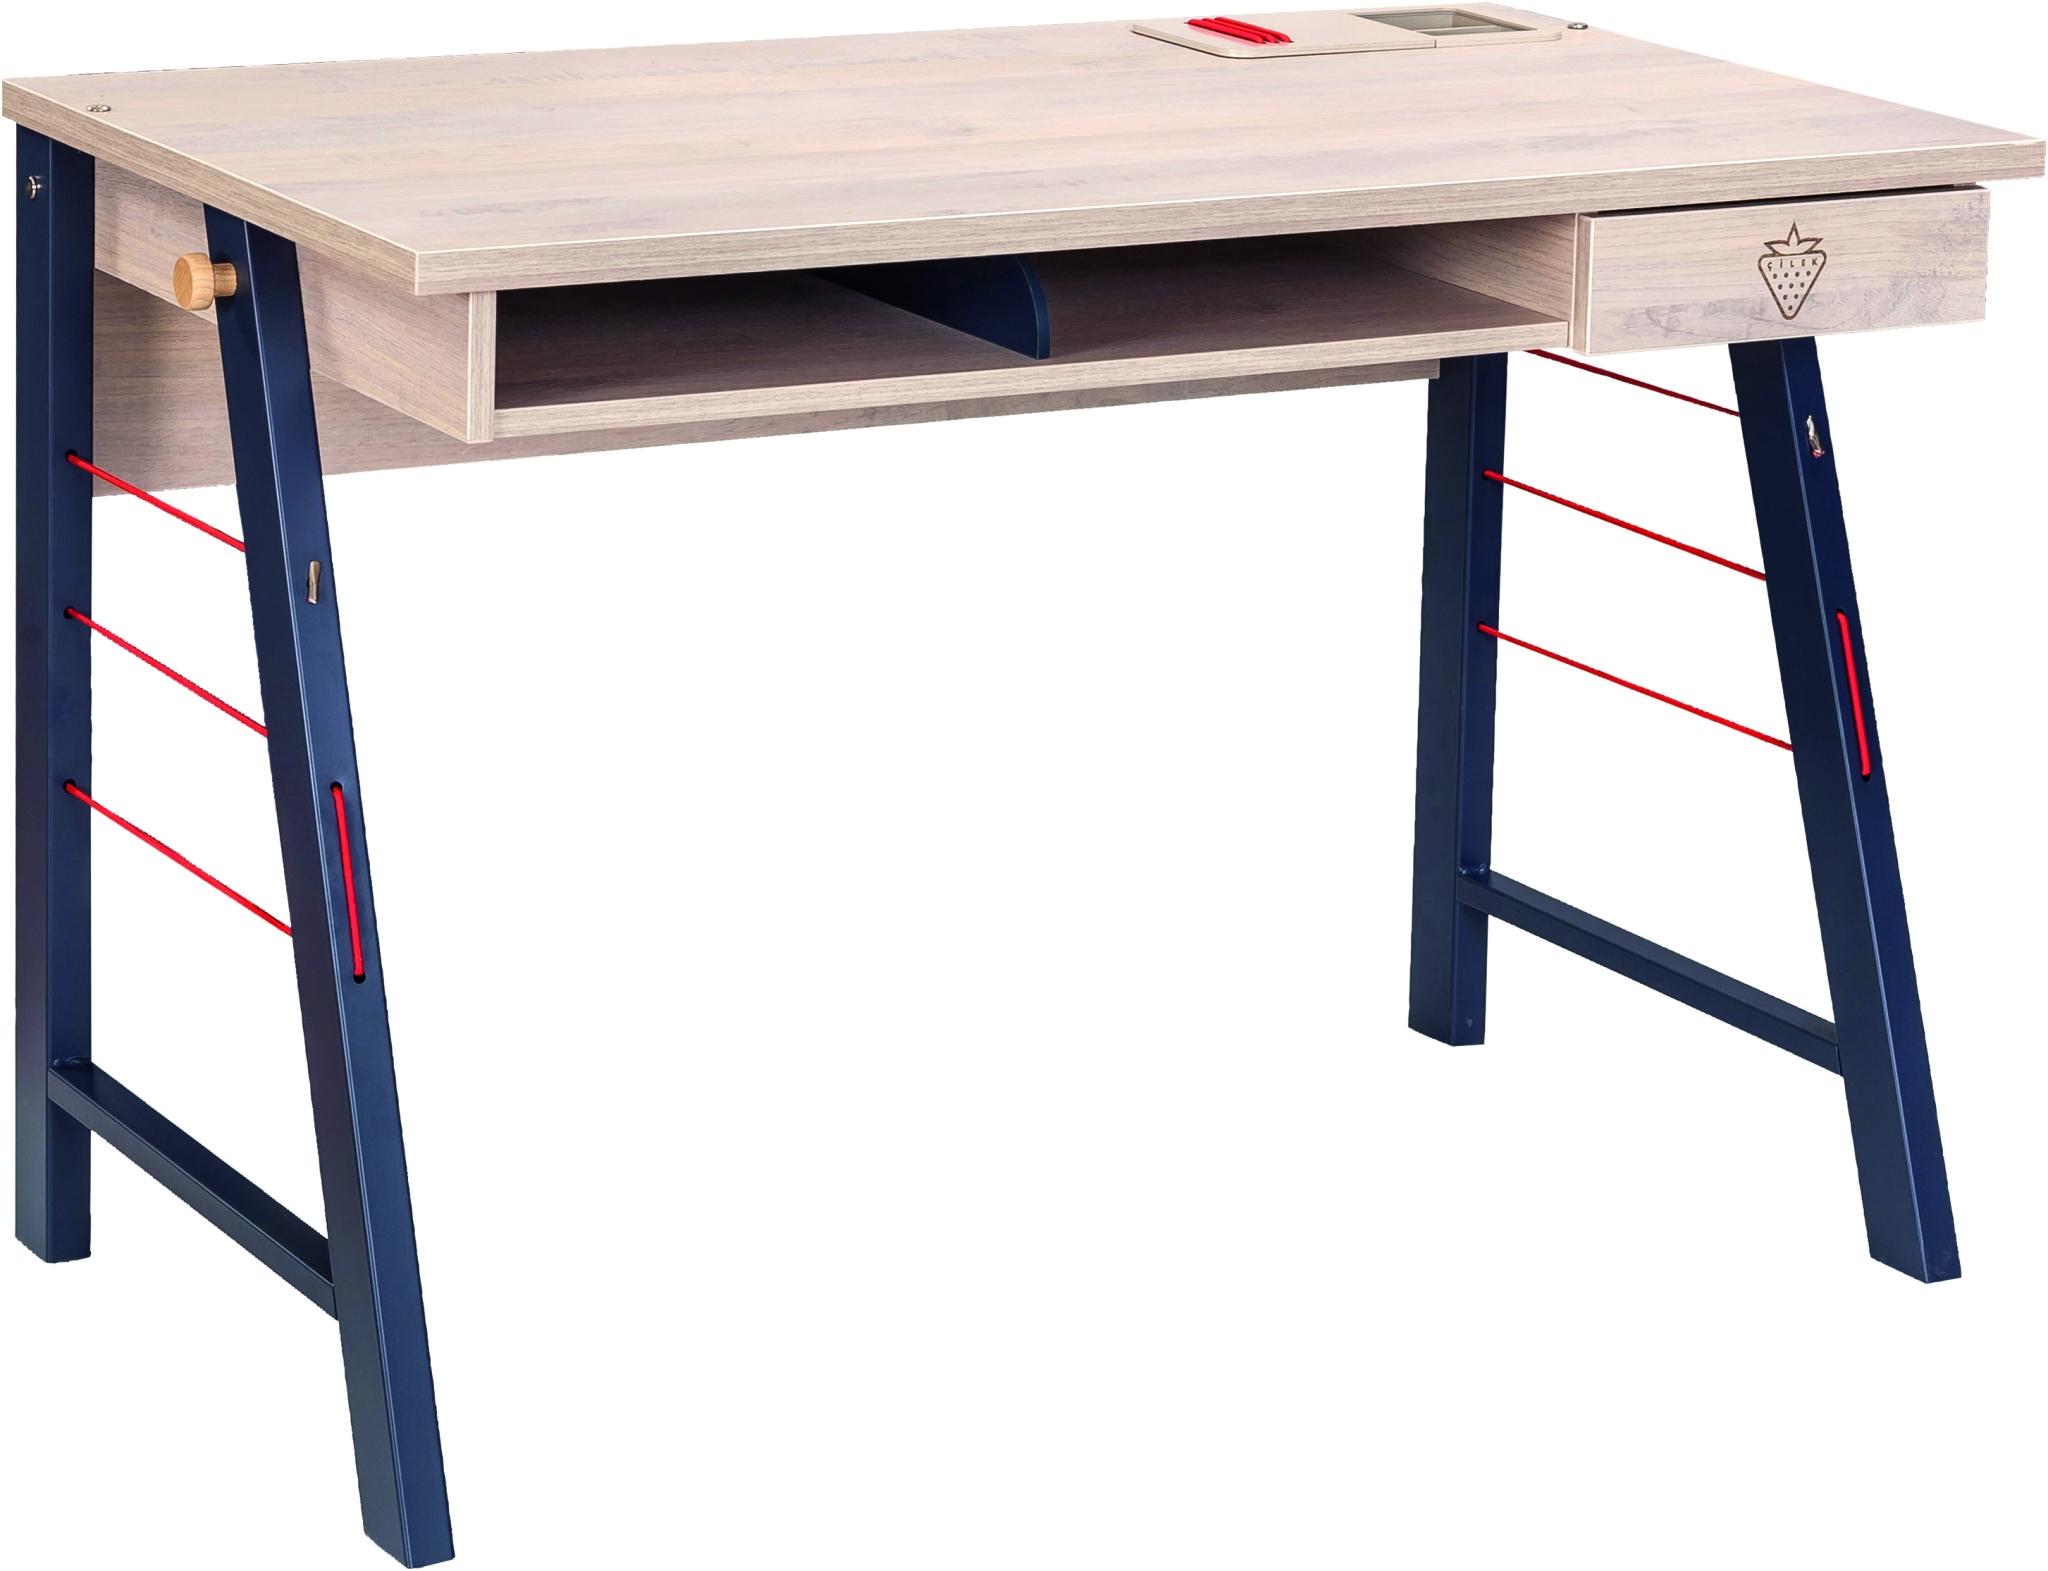 Masa de birou din pal si metal pentru tineret, baieti 12-24 ani, Trio Natur / Blue, l114xA64xH76 cm imagine